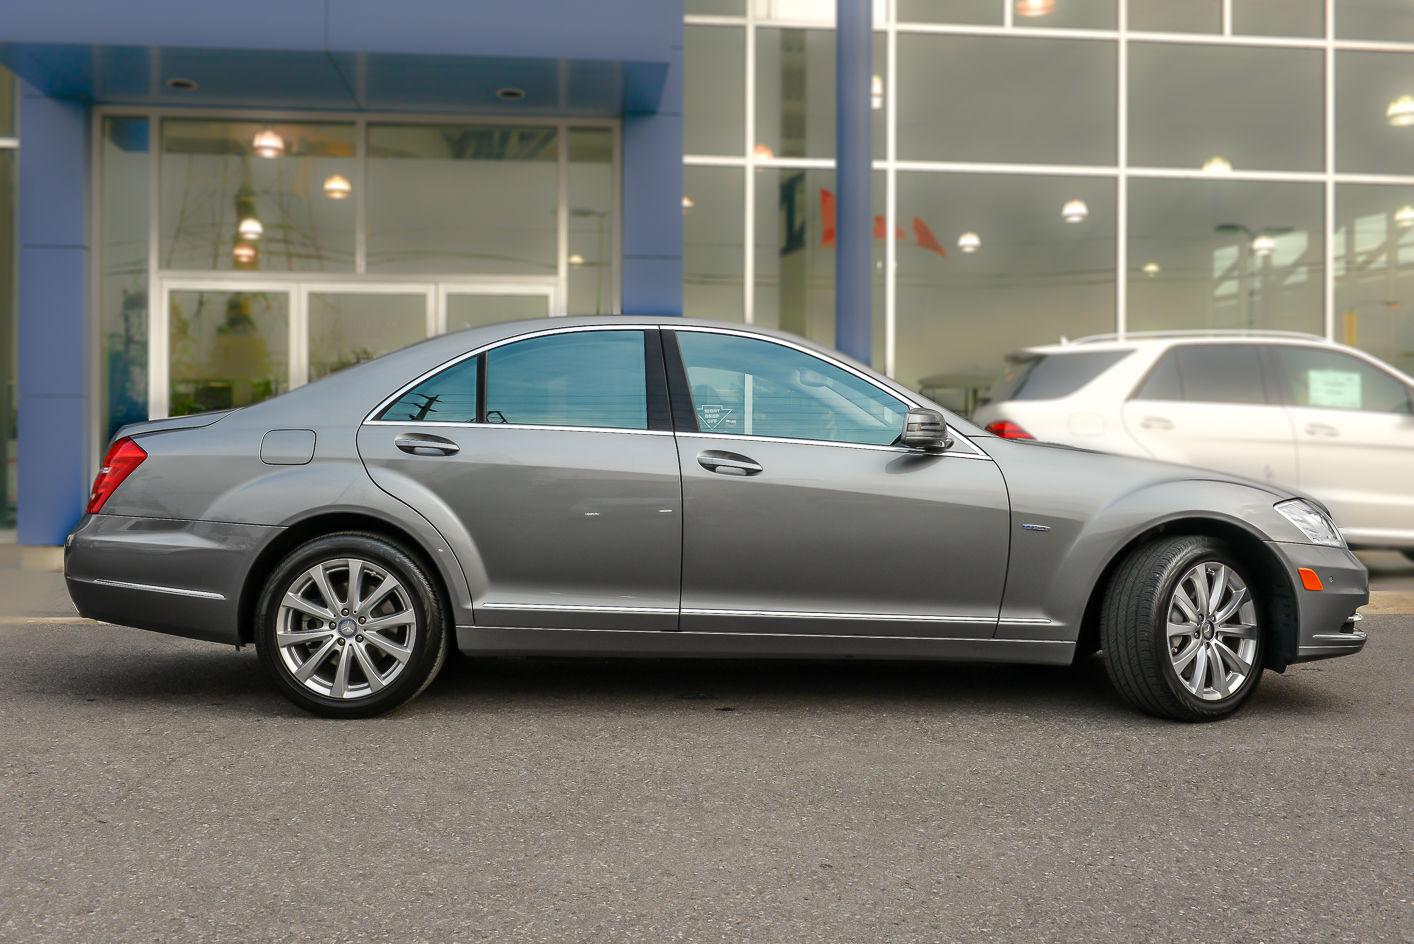 Pre owned 2012 mercedes benz s550 4matic sedan w4m in for Mercedes benz s550 certified pre owned